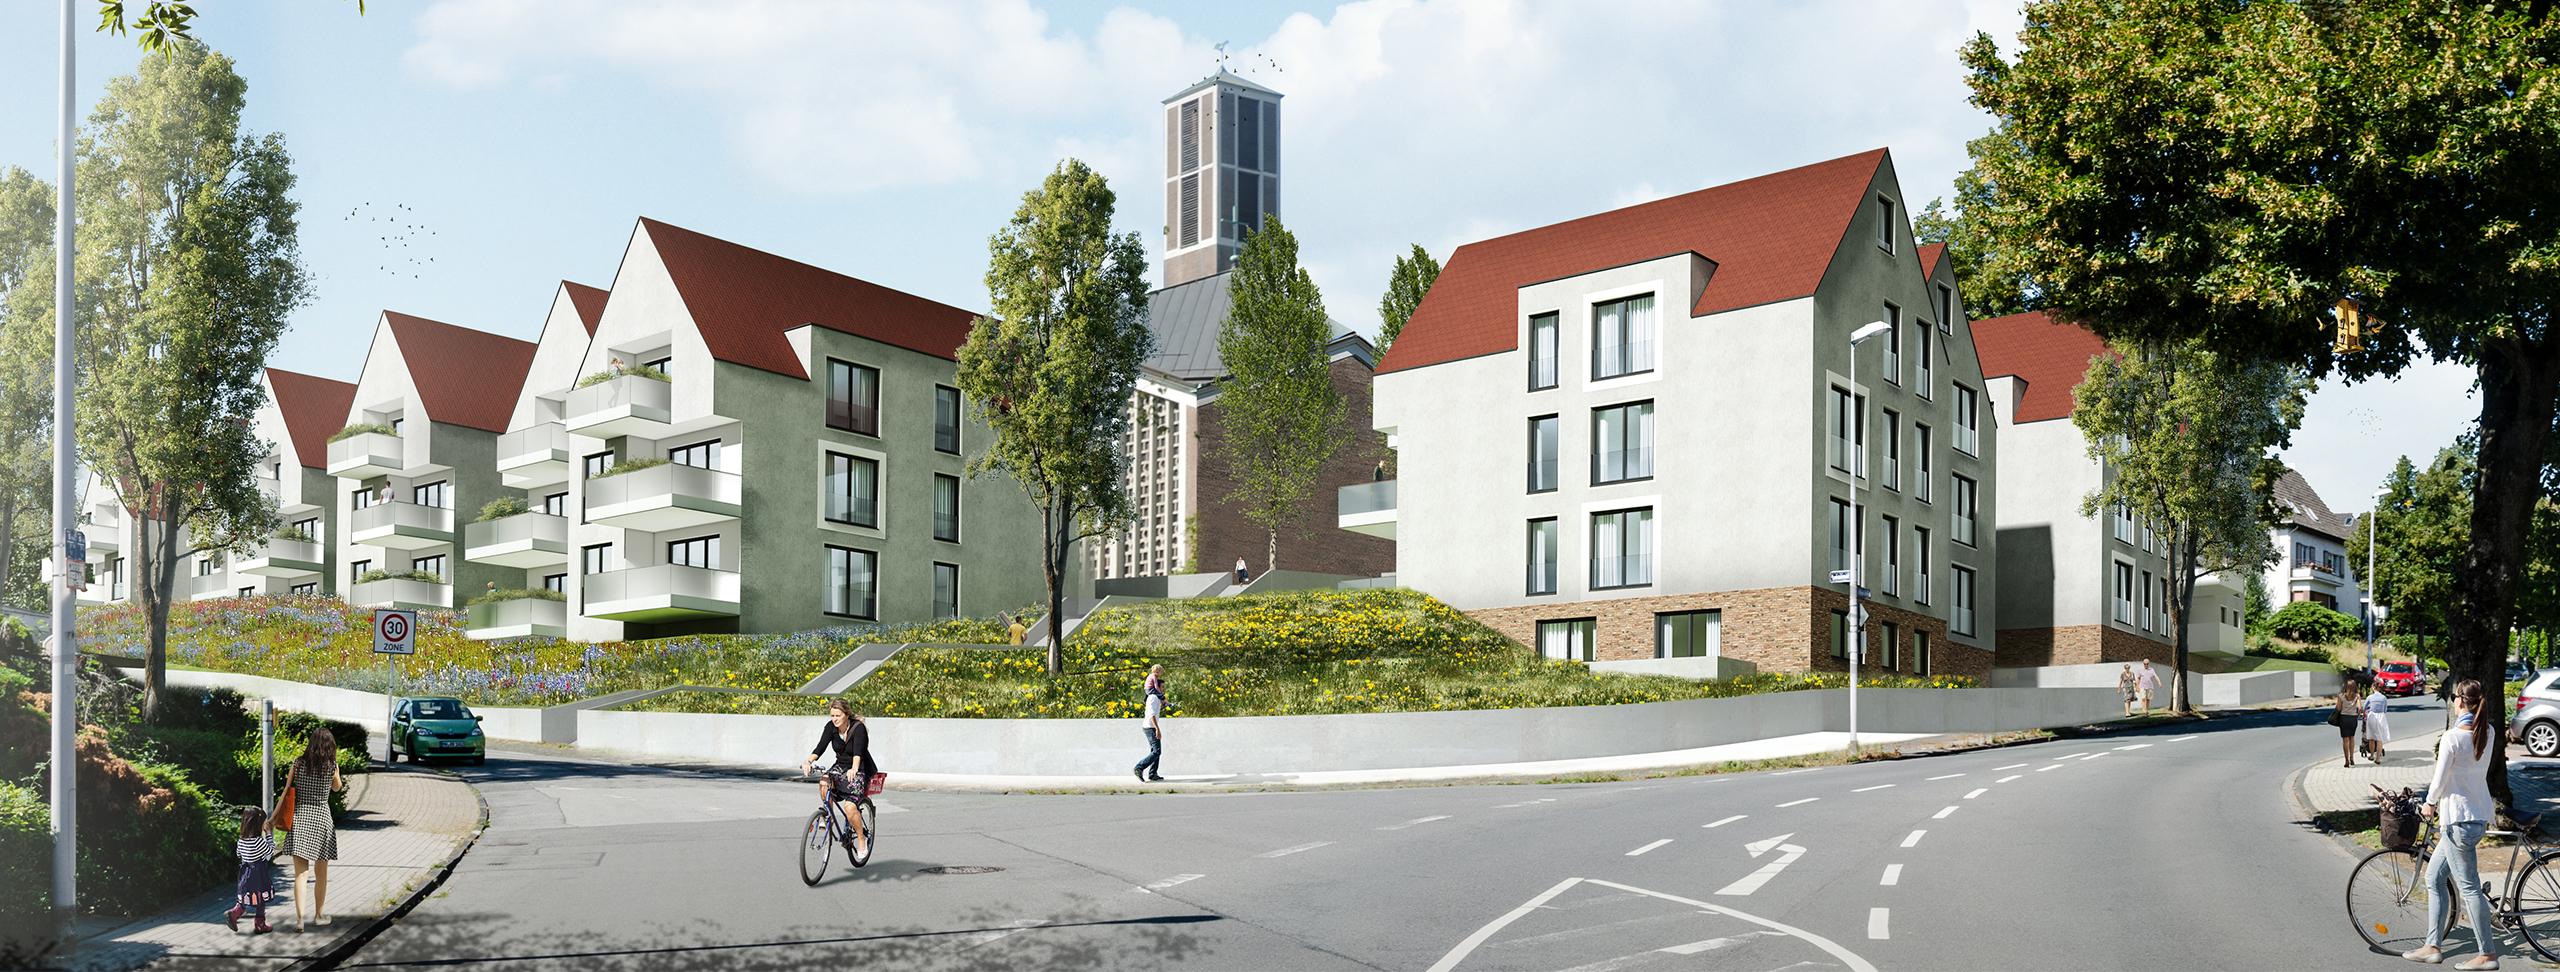 Projekt_lindenhof